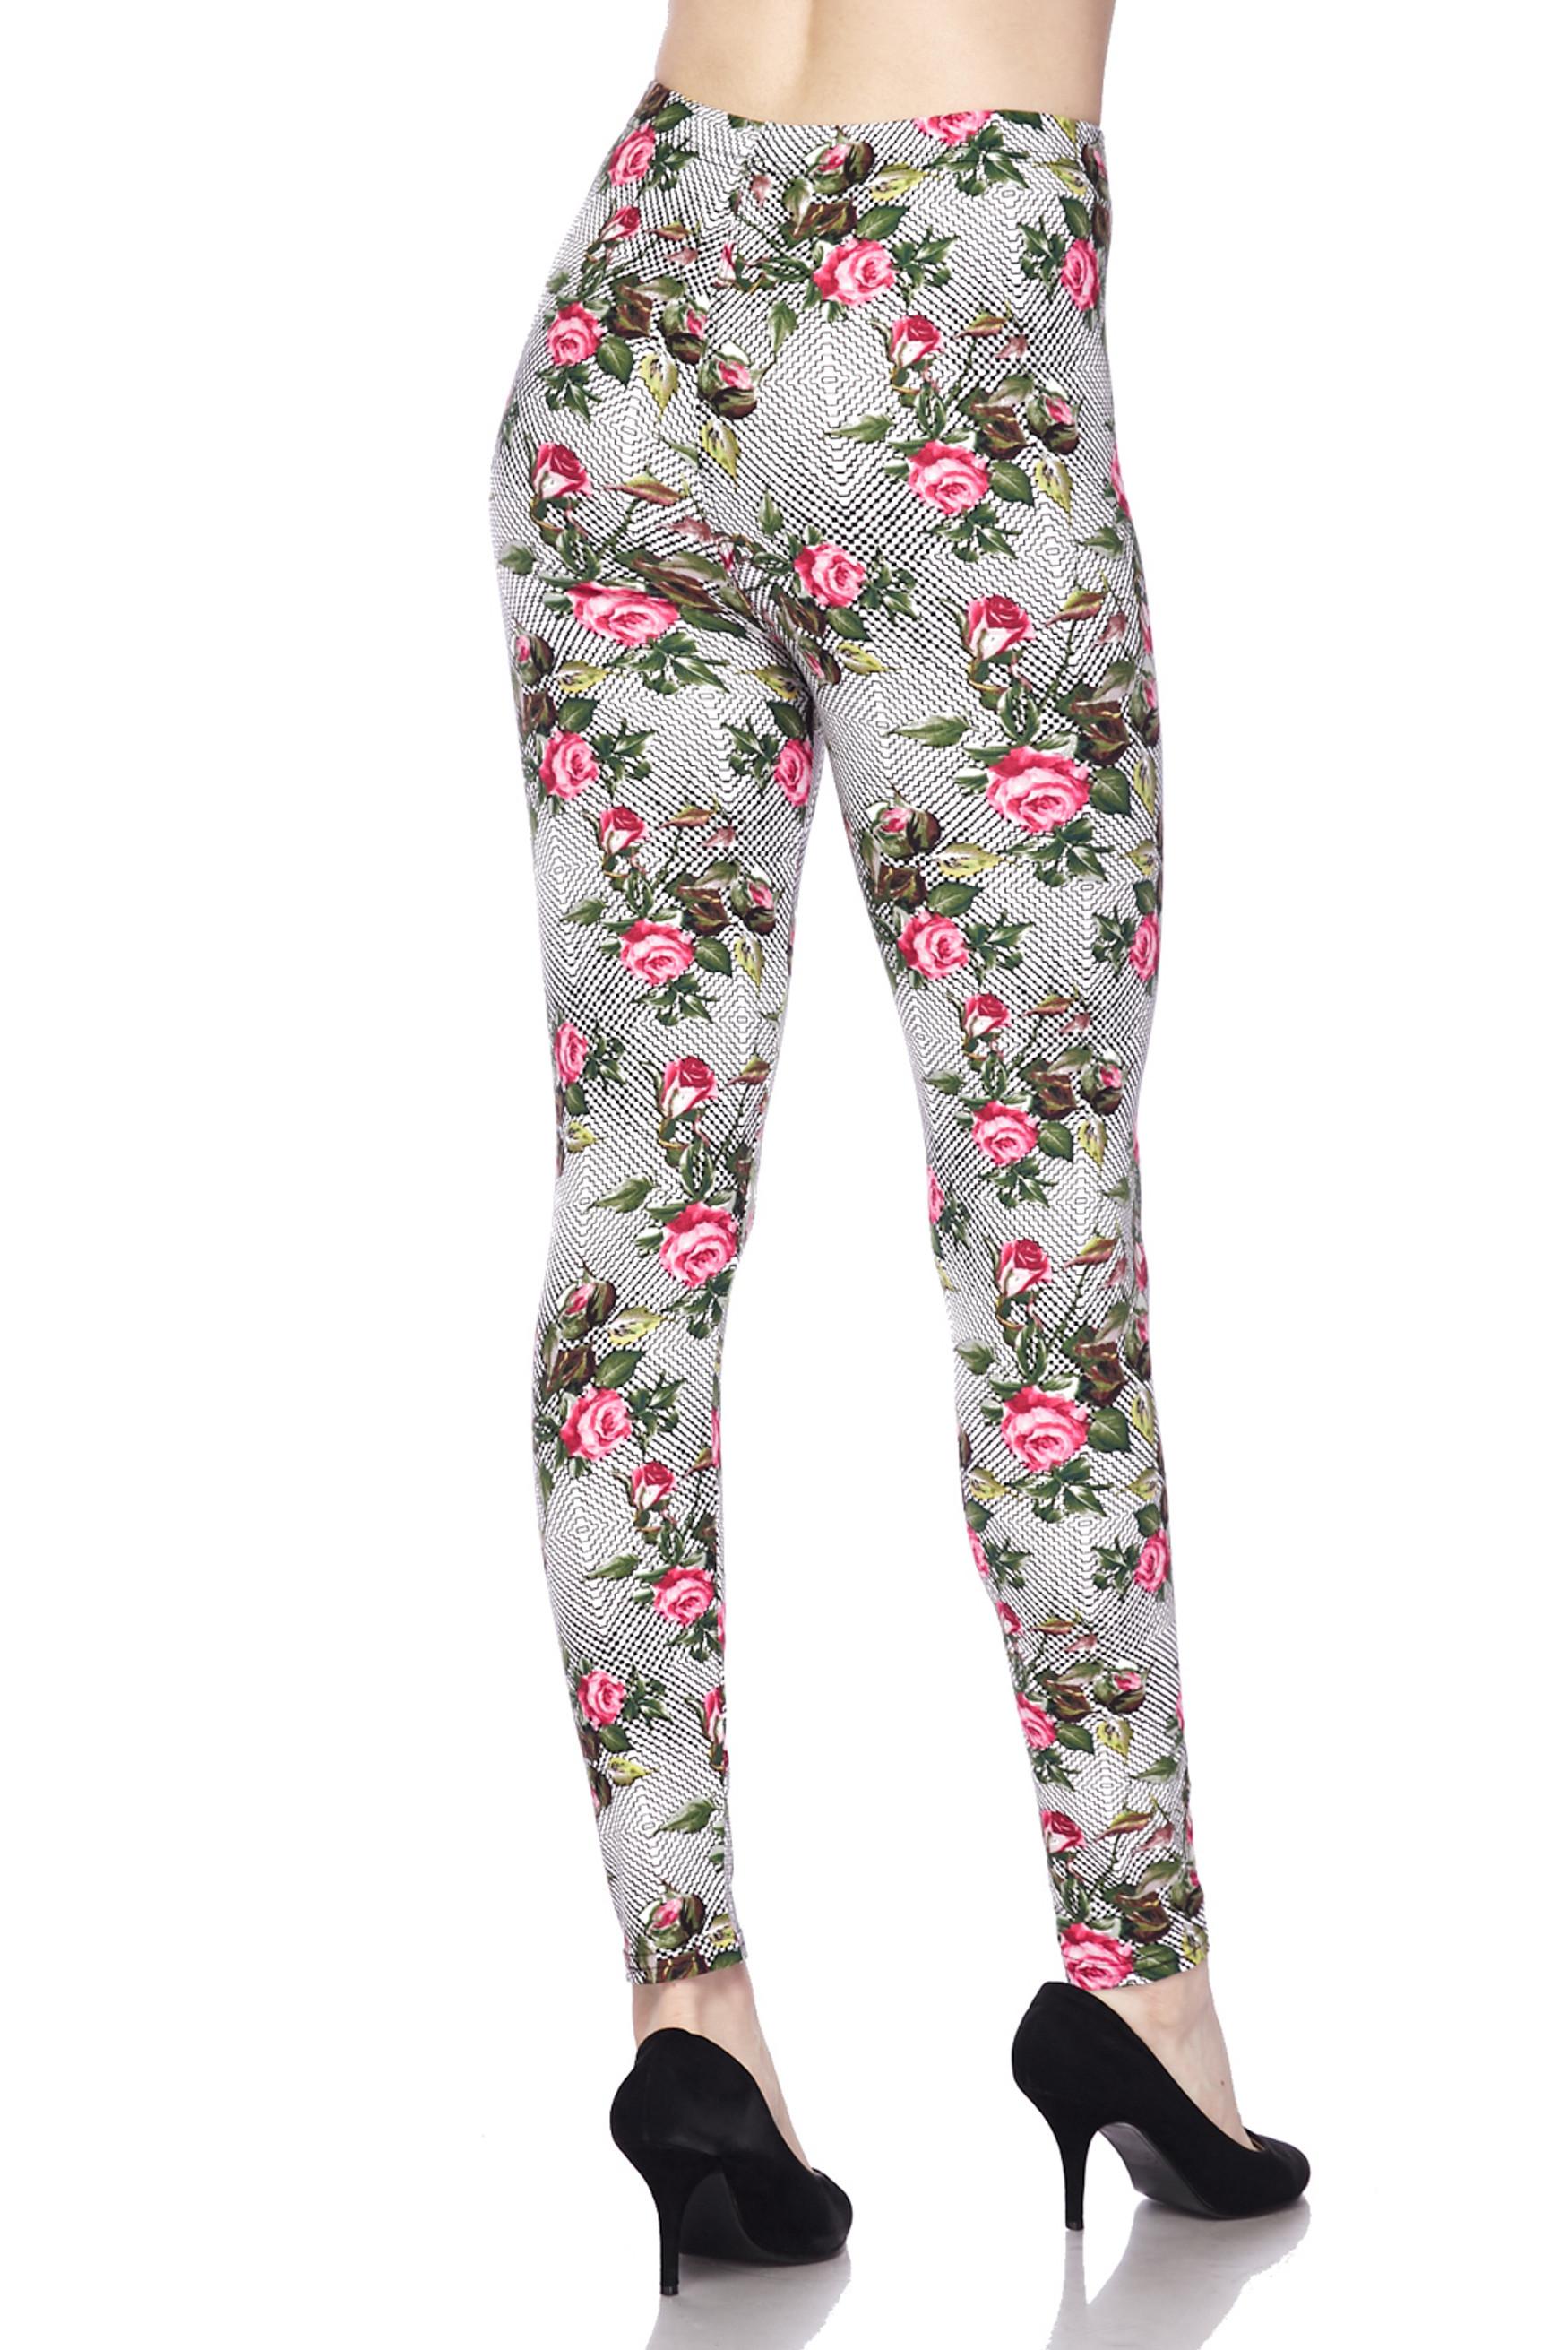 Soft Brushed Floral Rose Mirage Extra Plus Size Leggings - 3X-5X